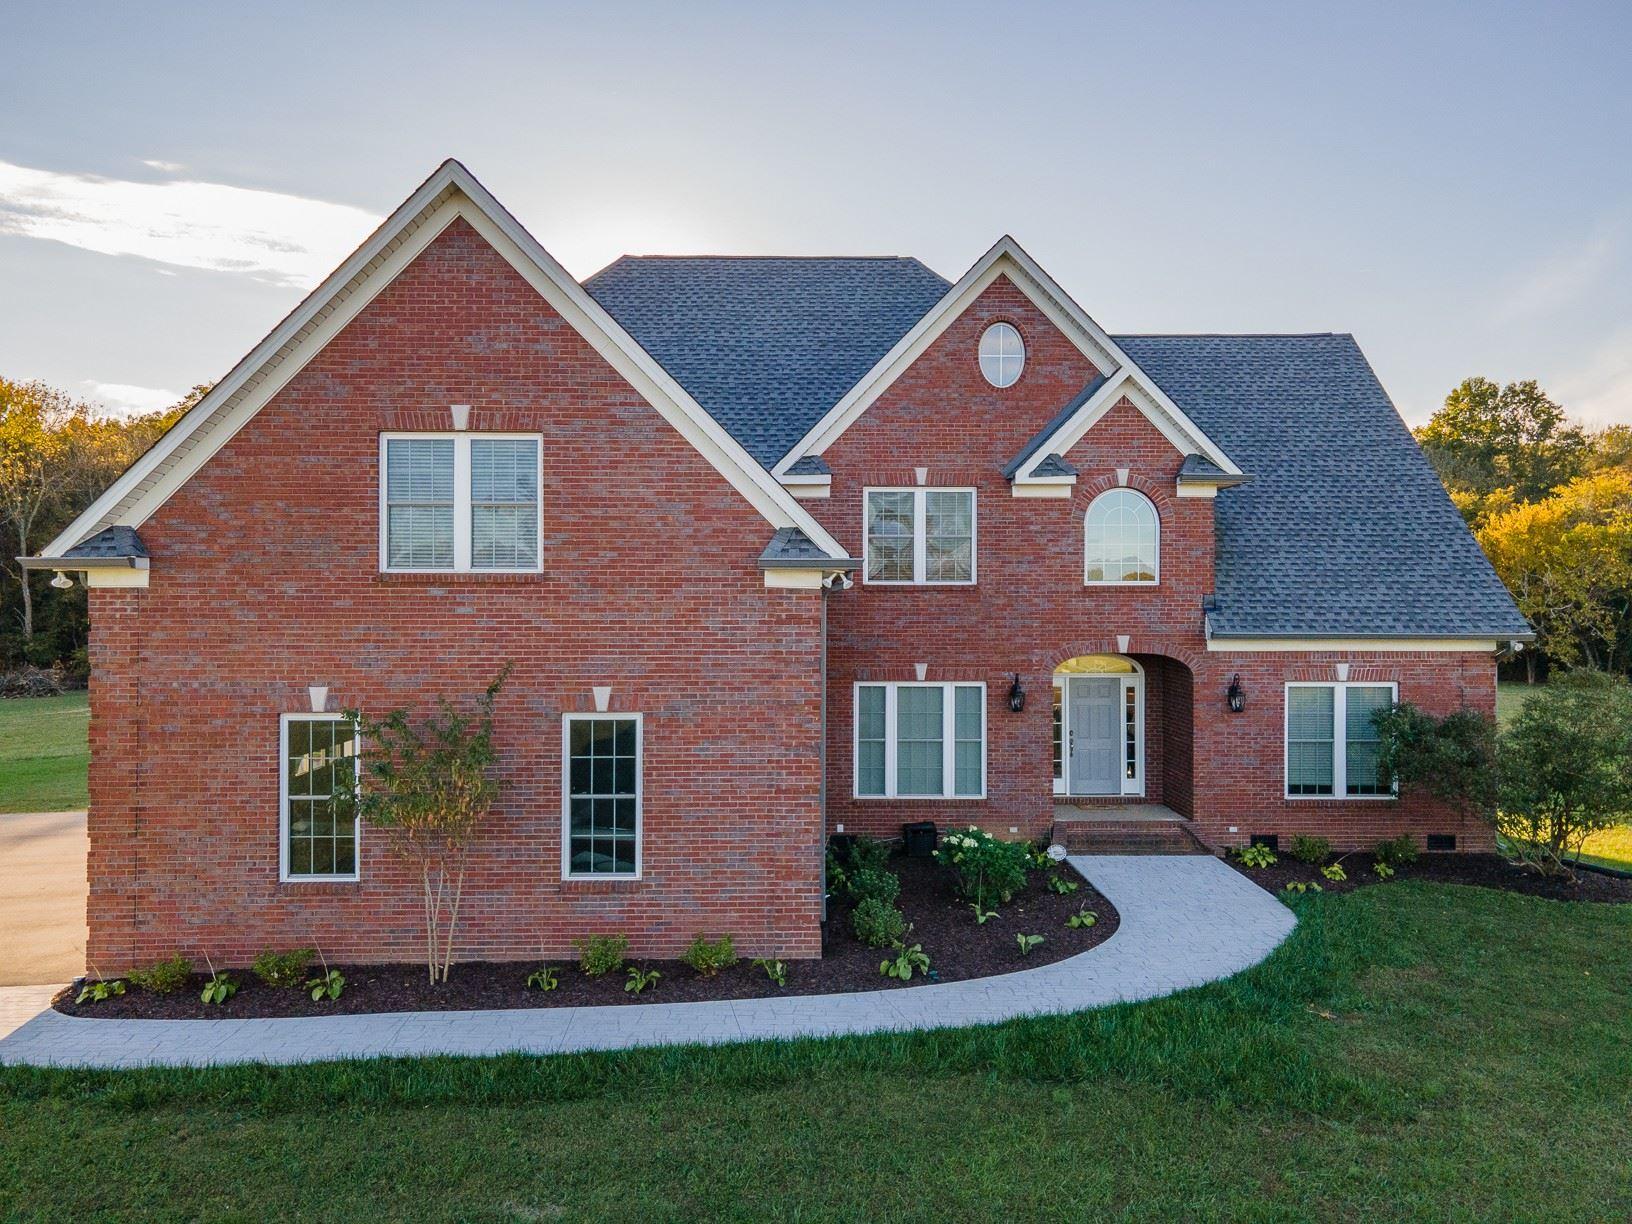 Photo of 5009 Ash Hill Rd, Spring Hill, TN 37174 (MLS # 2289989)